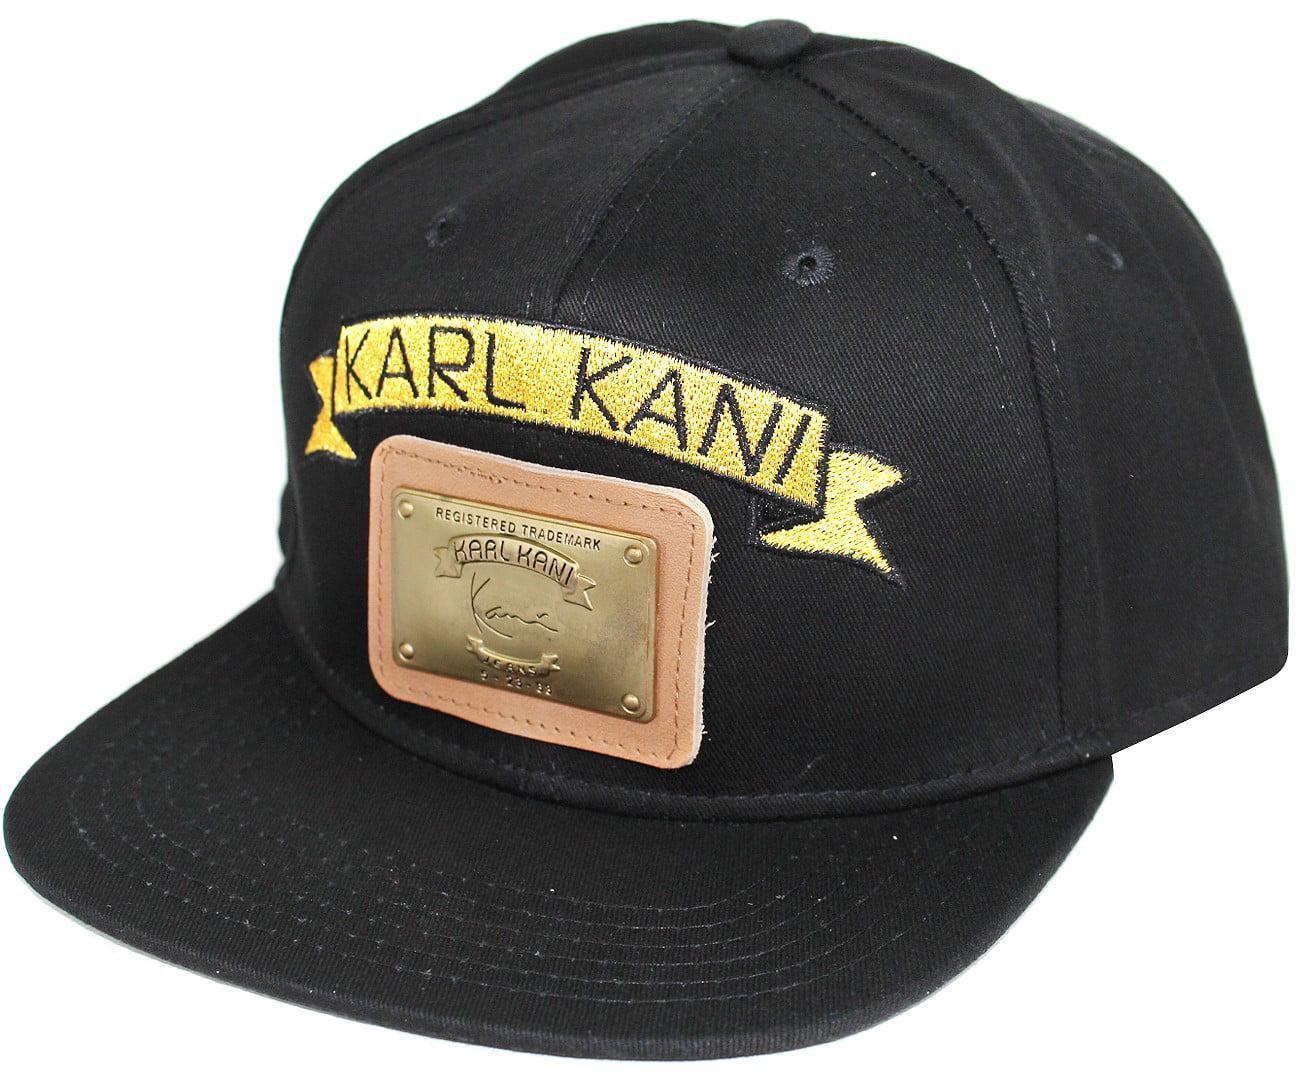 e59a30759c2b8 Karl Kani - Karl Kani Gold Plate Snapback Embroidered Hat Black White Red  Tan - Walmart.com